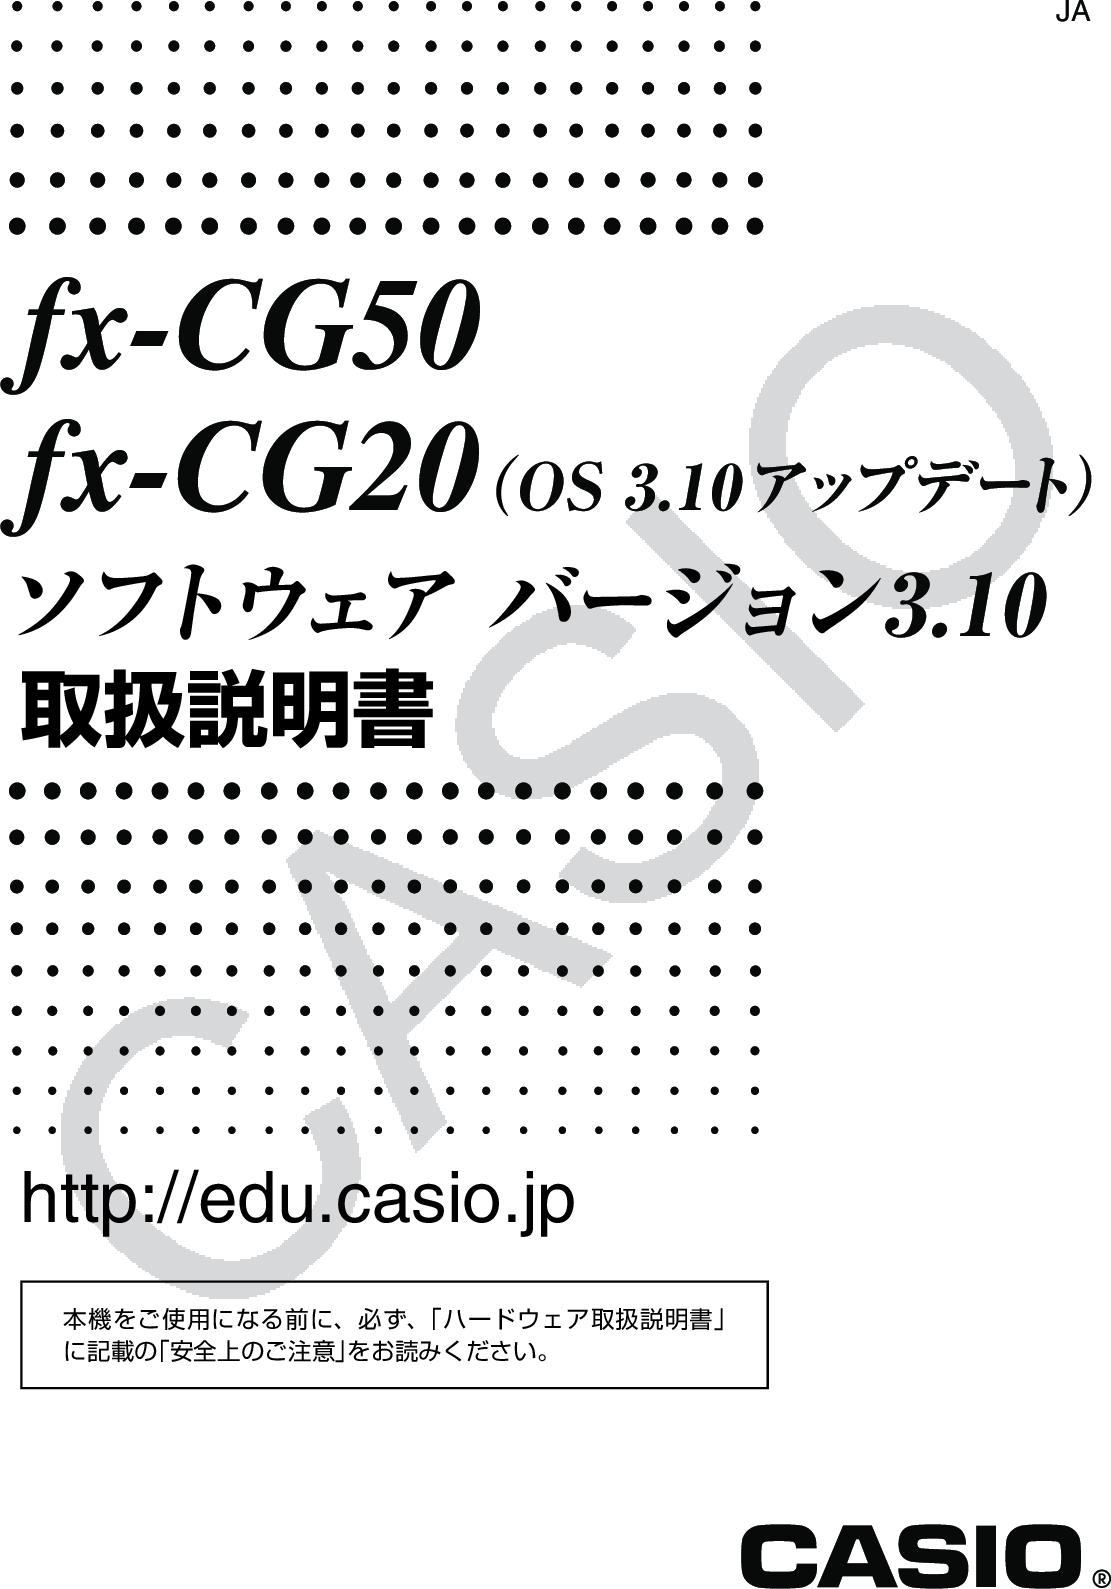 Casio Fx CG50_fx CG20 CG50 (ソフトウェア バージョン3.10) Soft V310 J